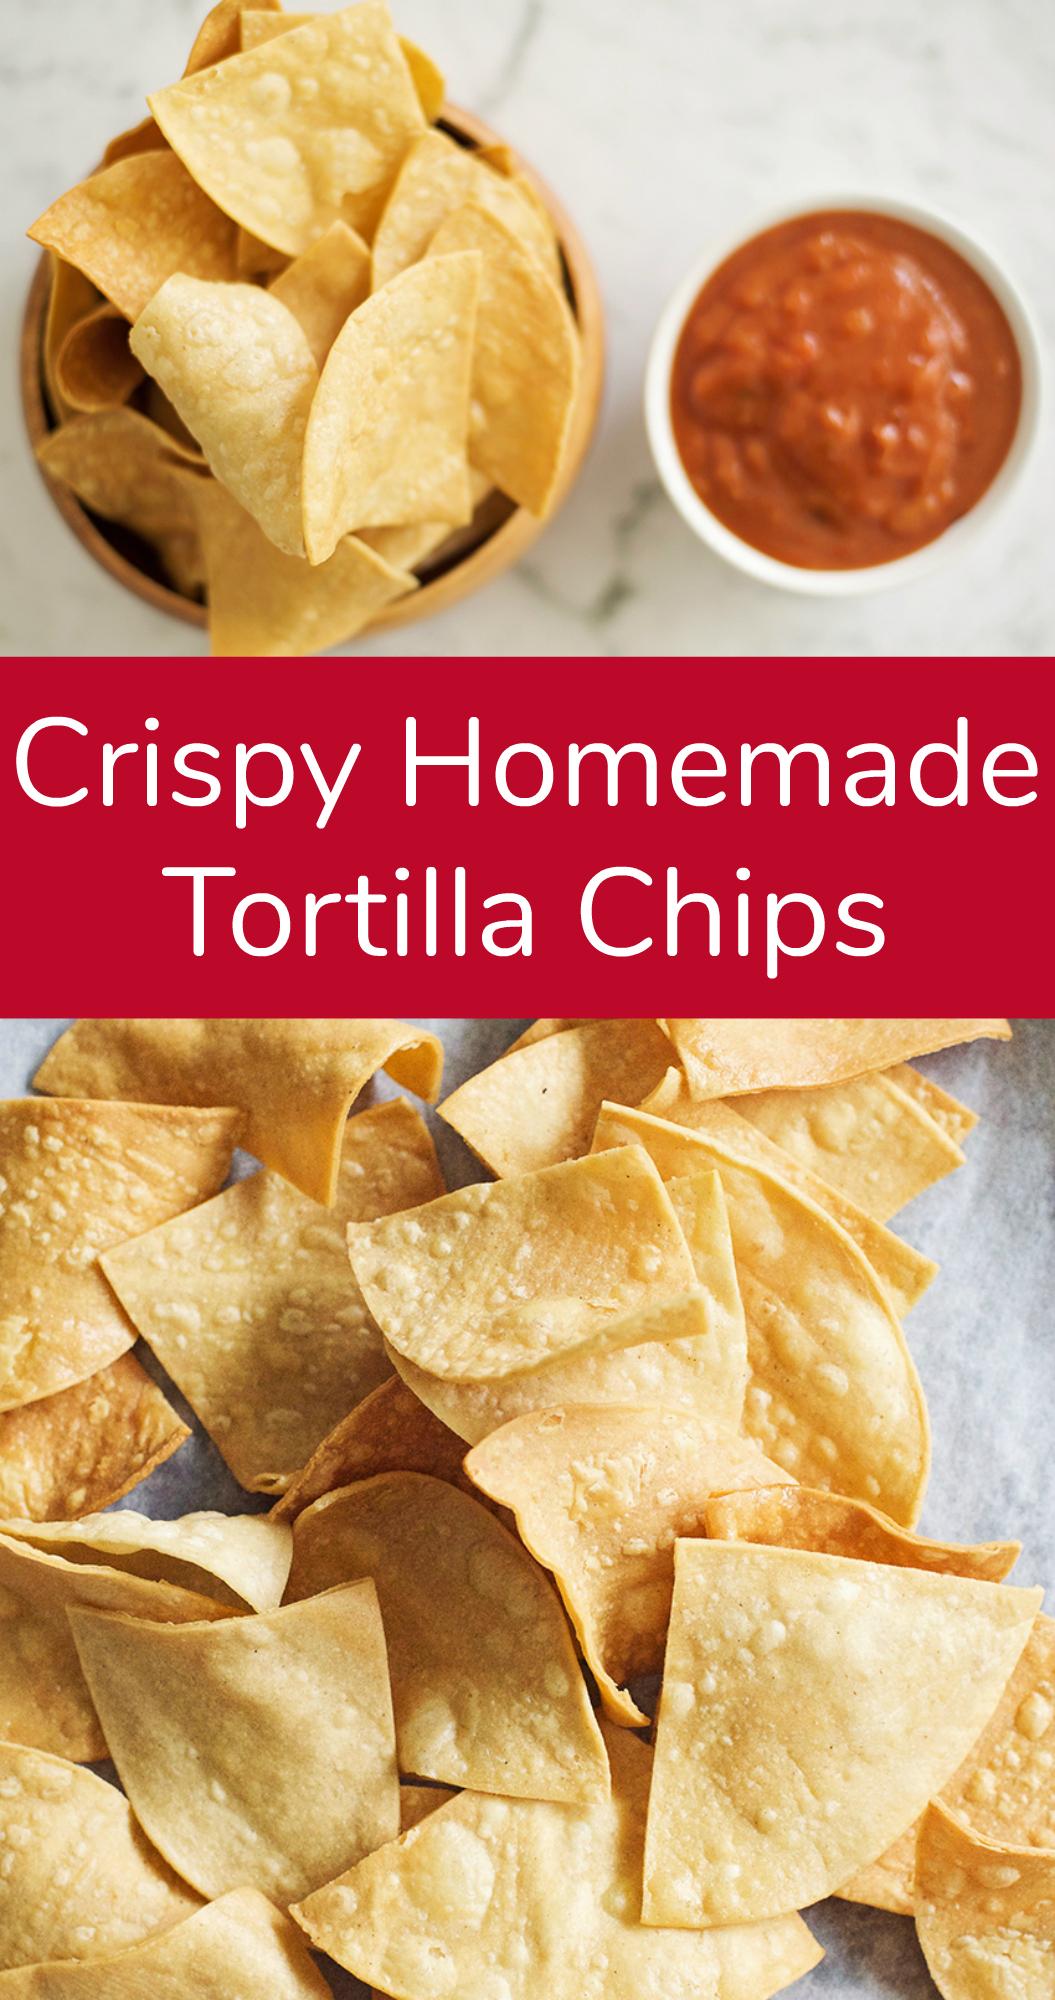 Crispy Homemade Tortilla Chips Appetizer